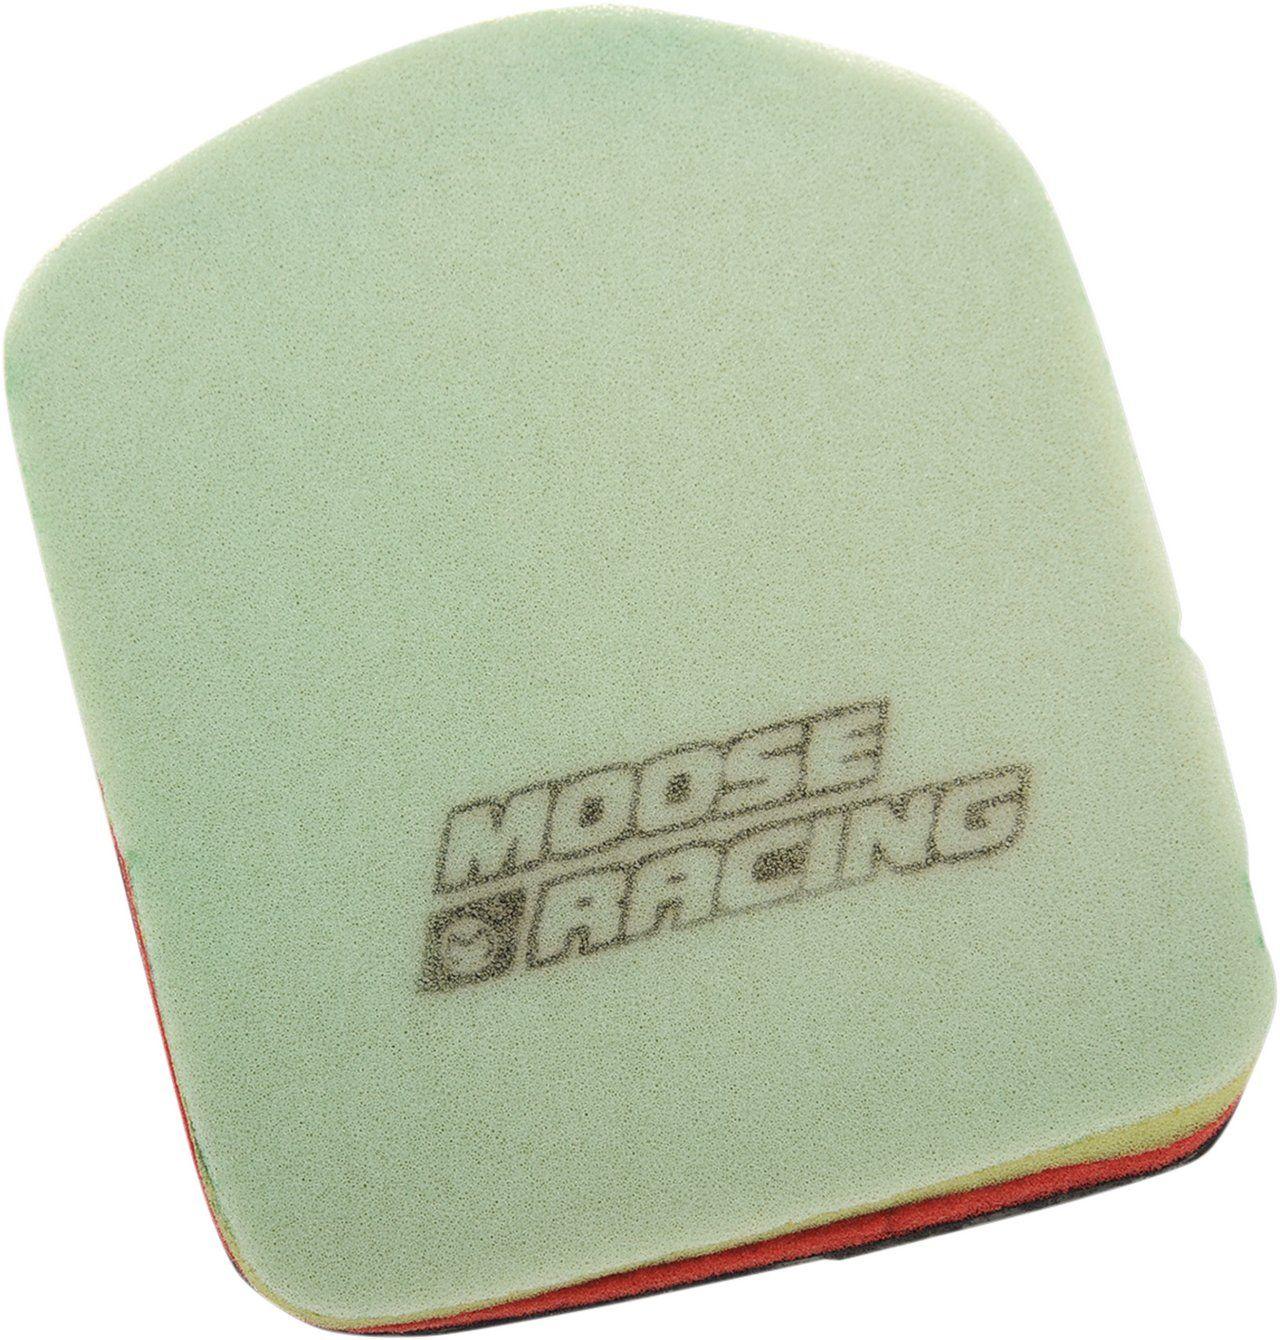 【MOOSE RACING】PRECISION PRE-OILED 空氣濾芯 [1011-2792] - 「Webike-摩托百貨」